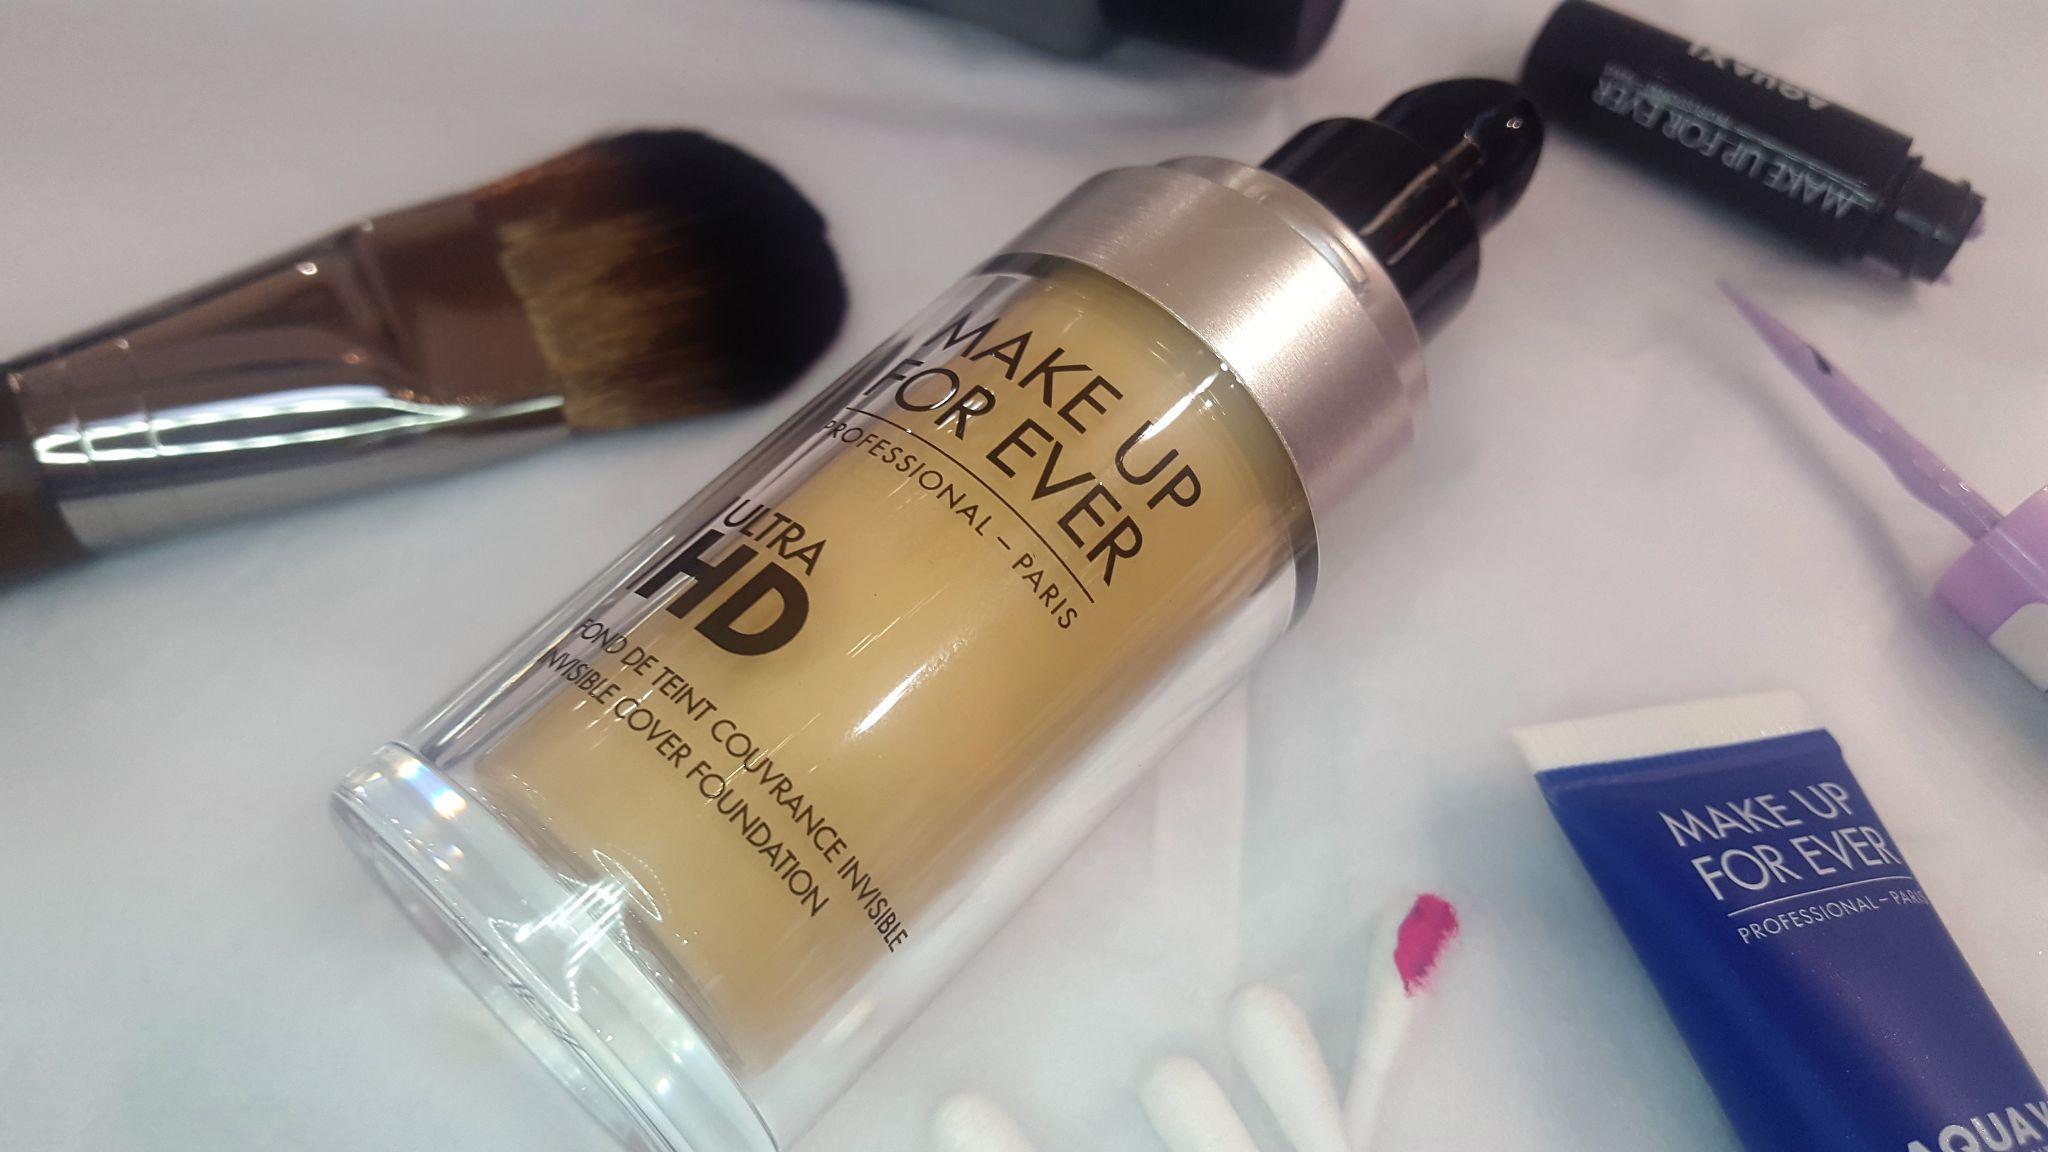 20170614 191256 1440x810 - Make Up Forever: New Debenhams branch @Intu Metrocentre